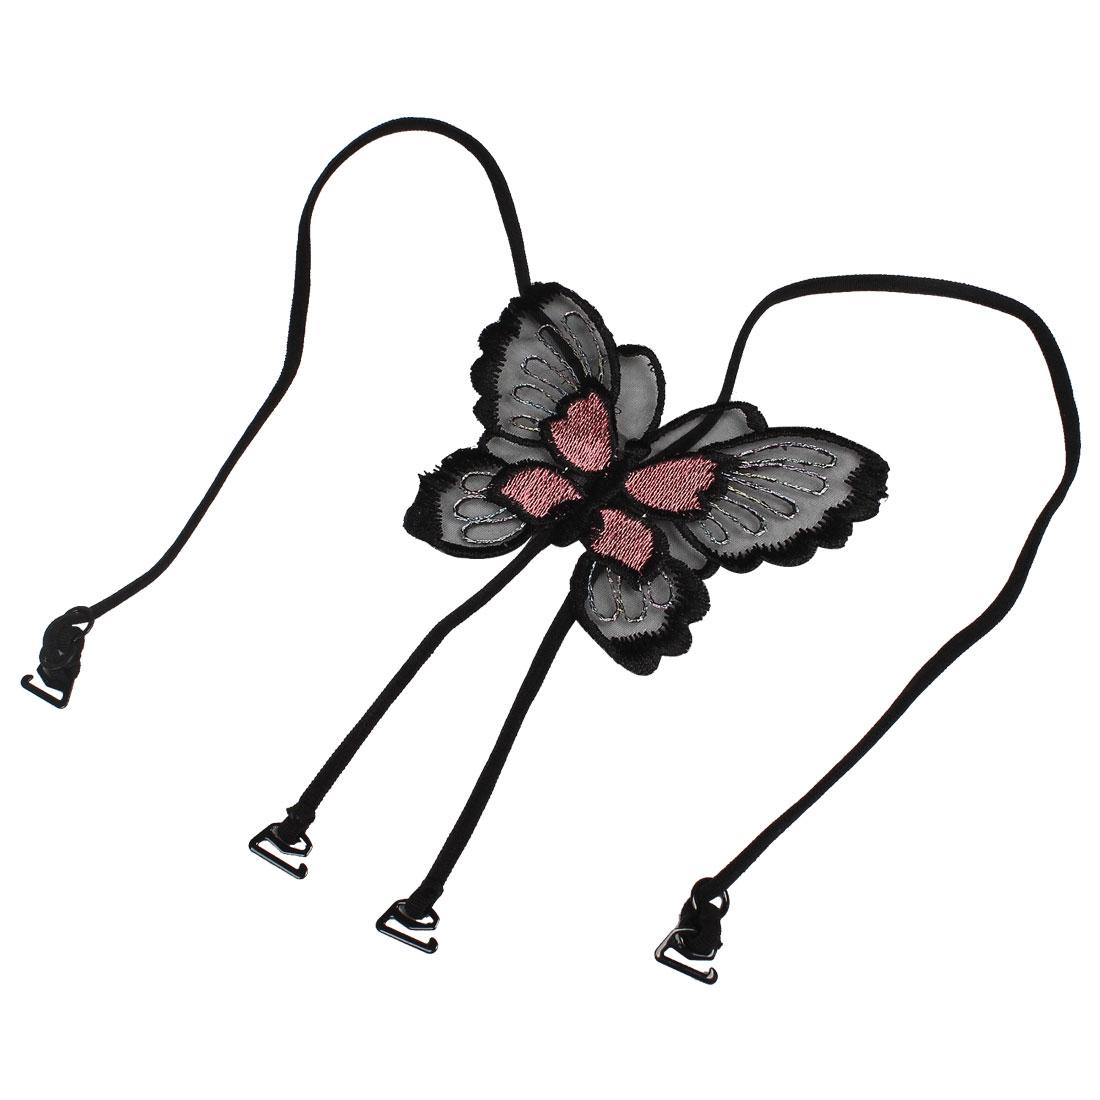 Slim Band Butterfly Shape Cross Back Bra Shoulder Straps Black Pink for Women